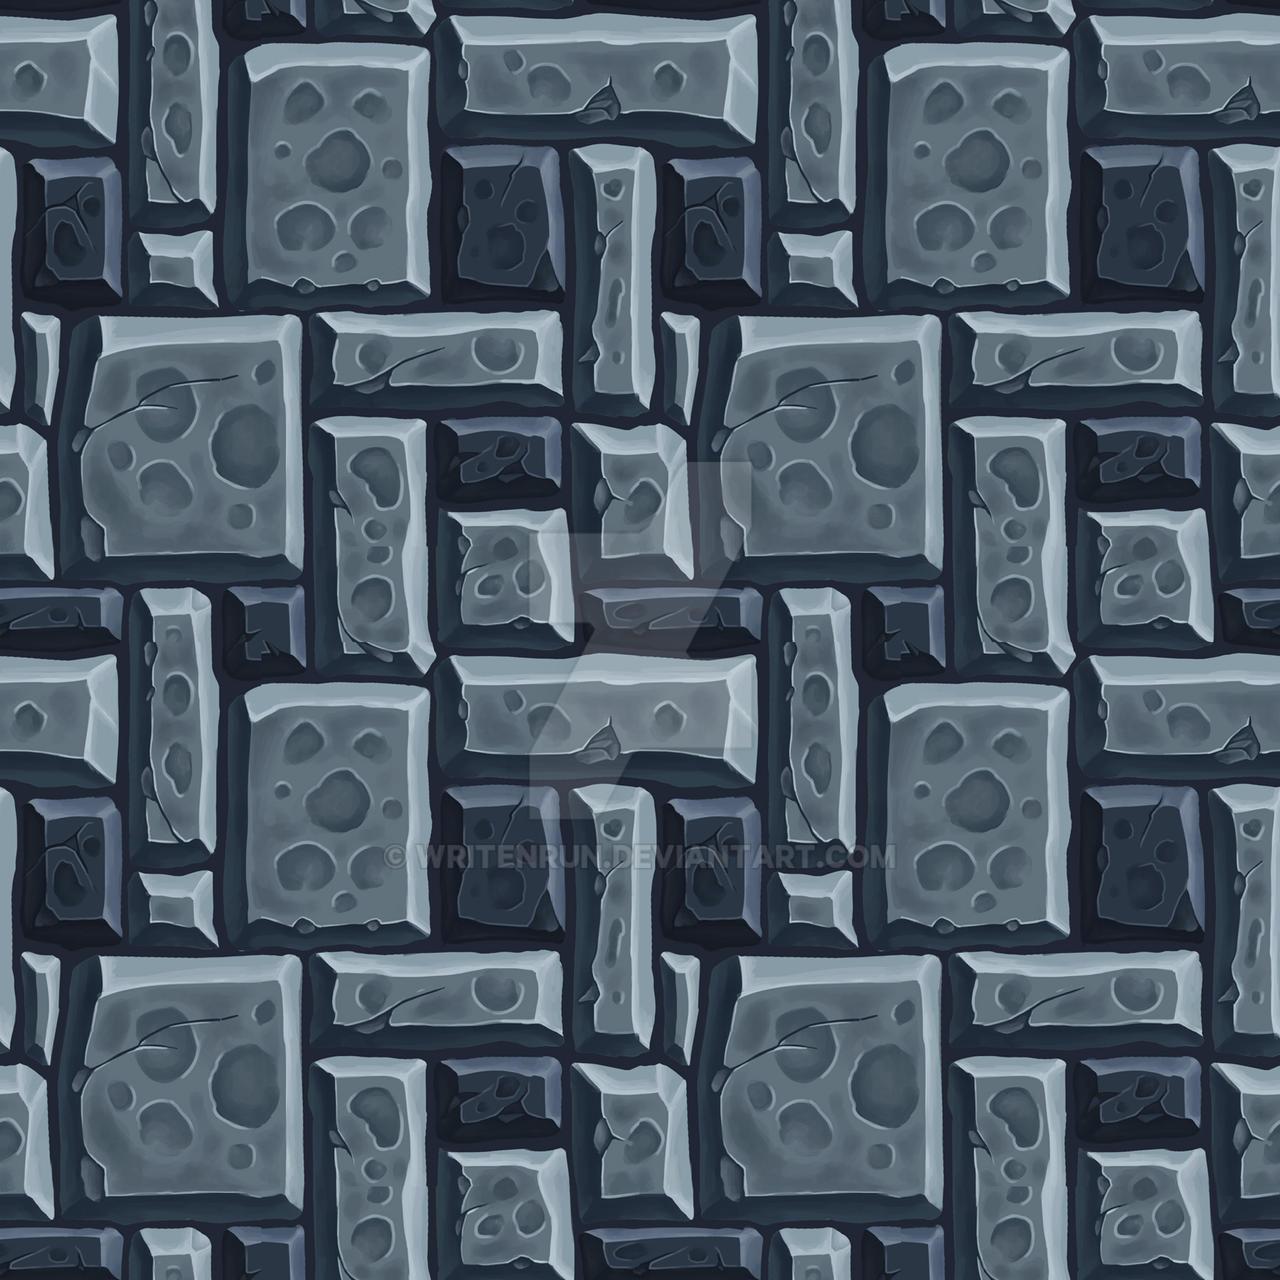 cartoon square stones texture - photo #25